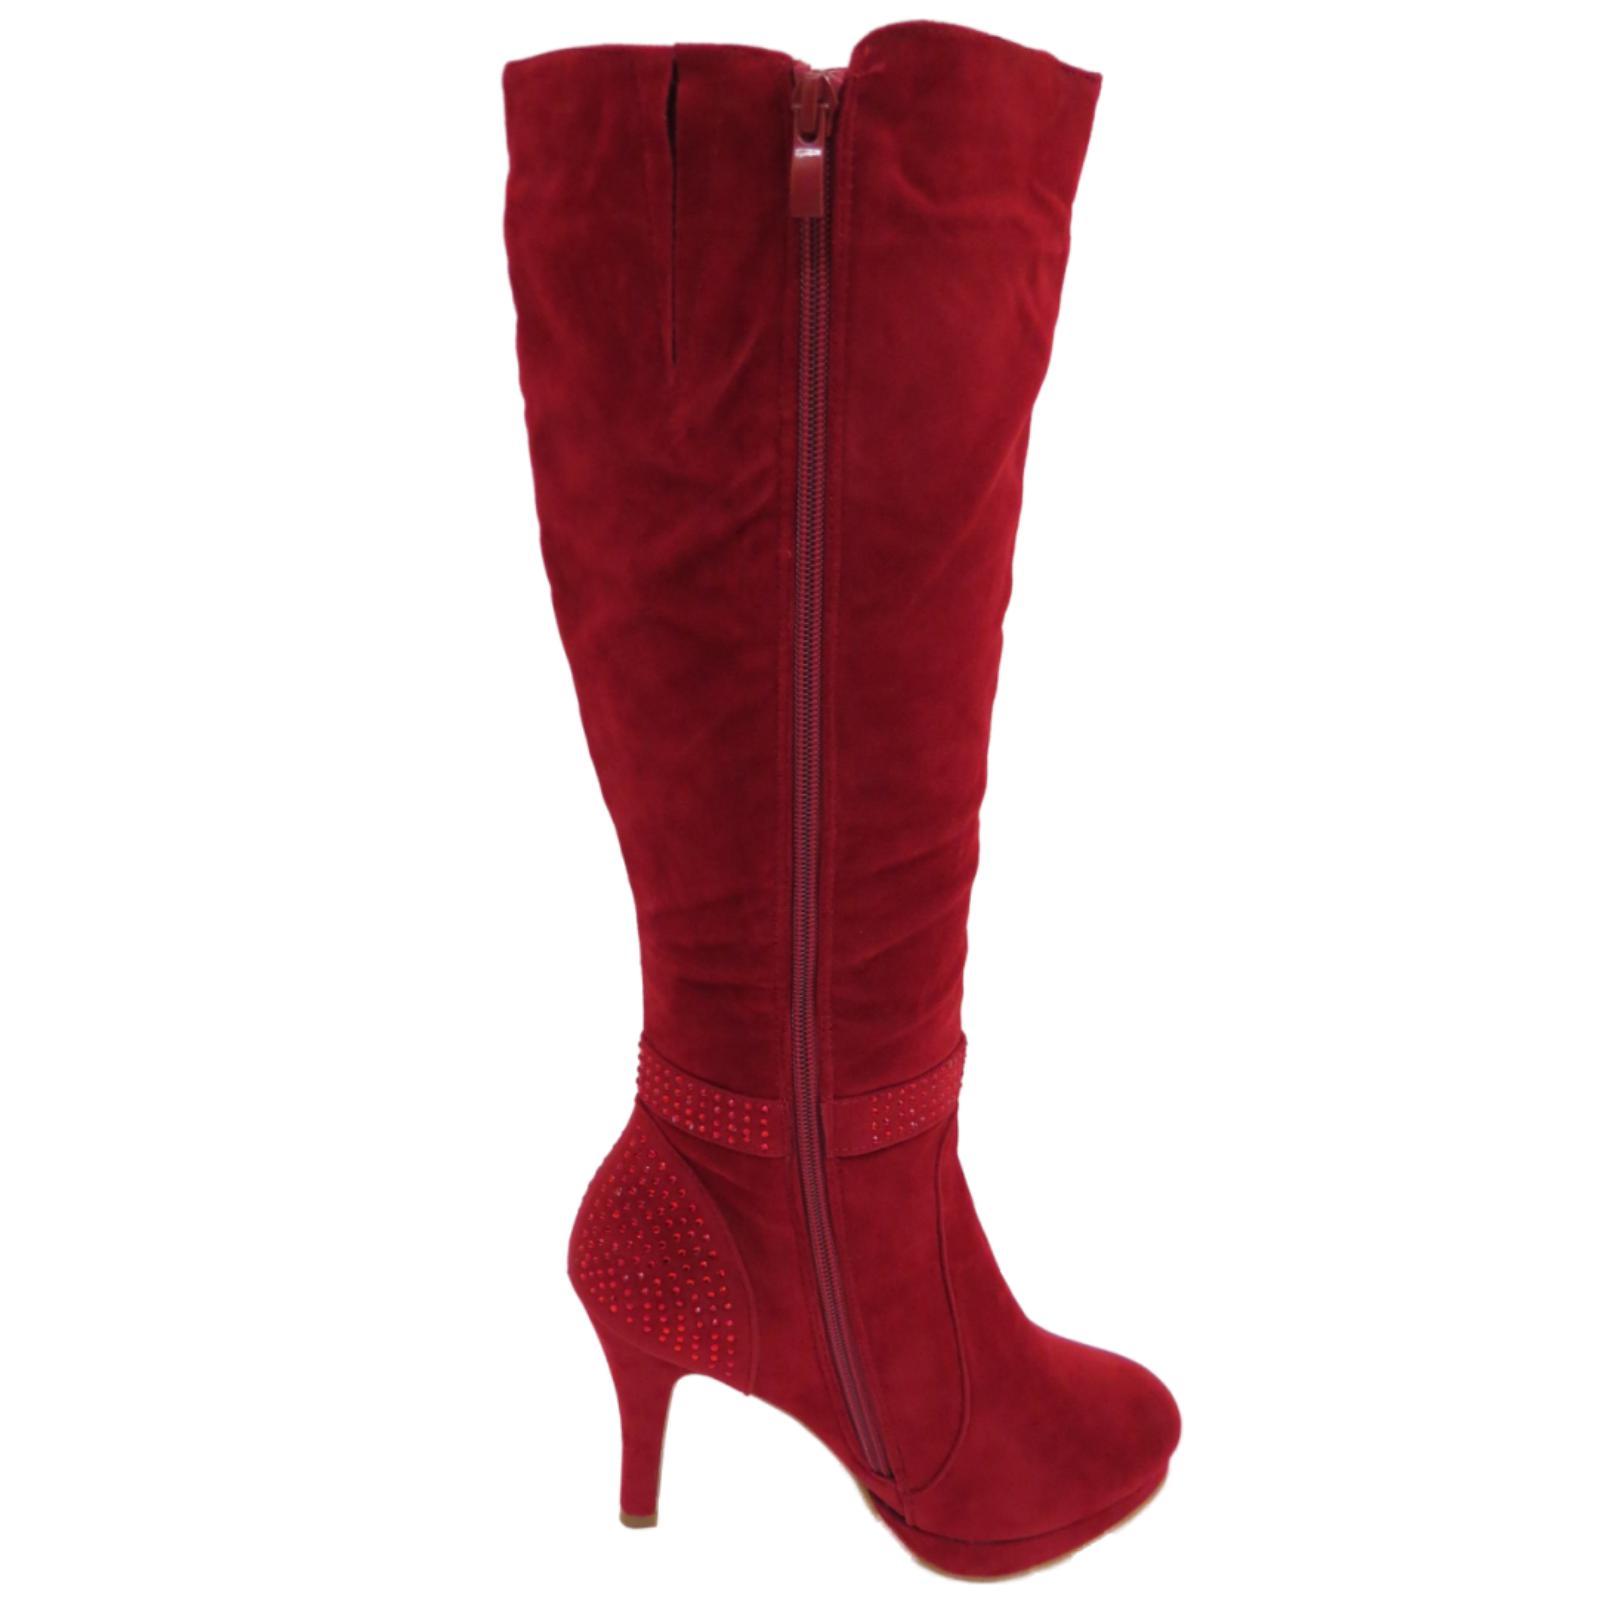 1a662f3f5c1 Sentinel WOMENS RED STILETTO HIGH HEEL KNEE-HIGH TALL ZIP PLATFORM BOOTS  SHOES UK 3-